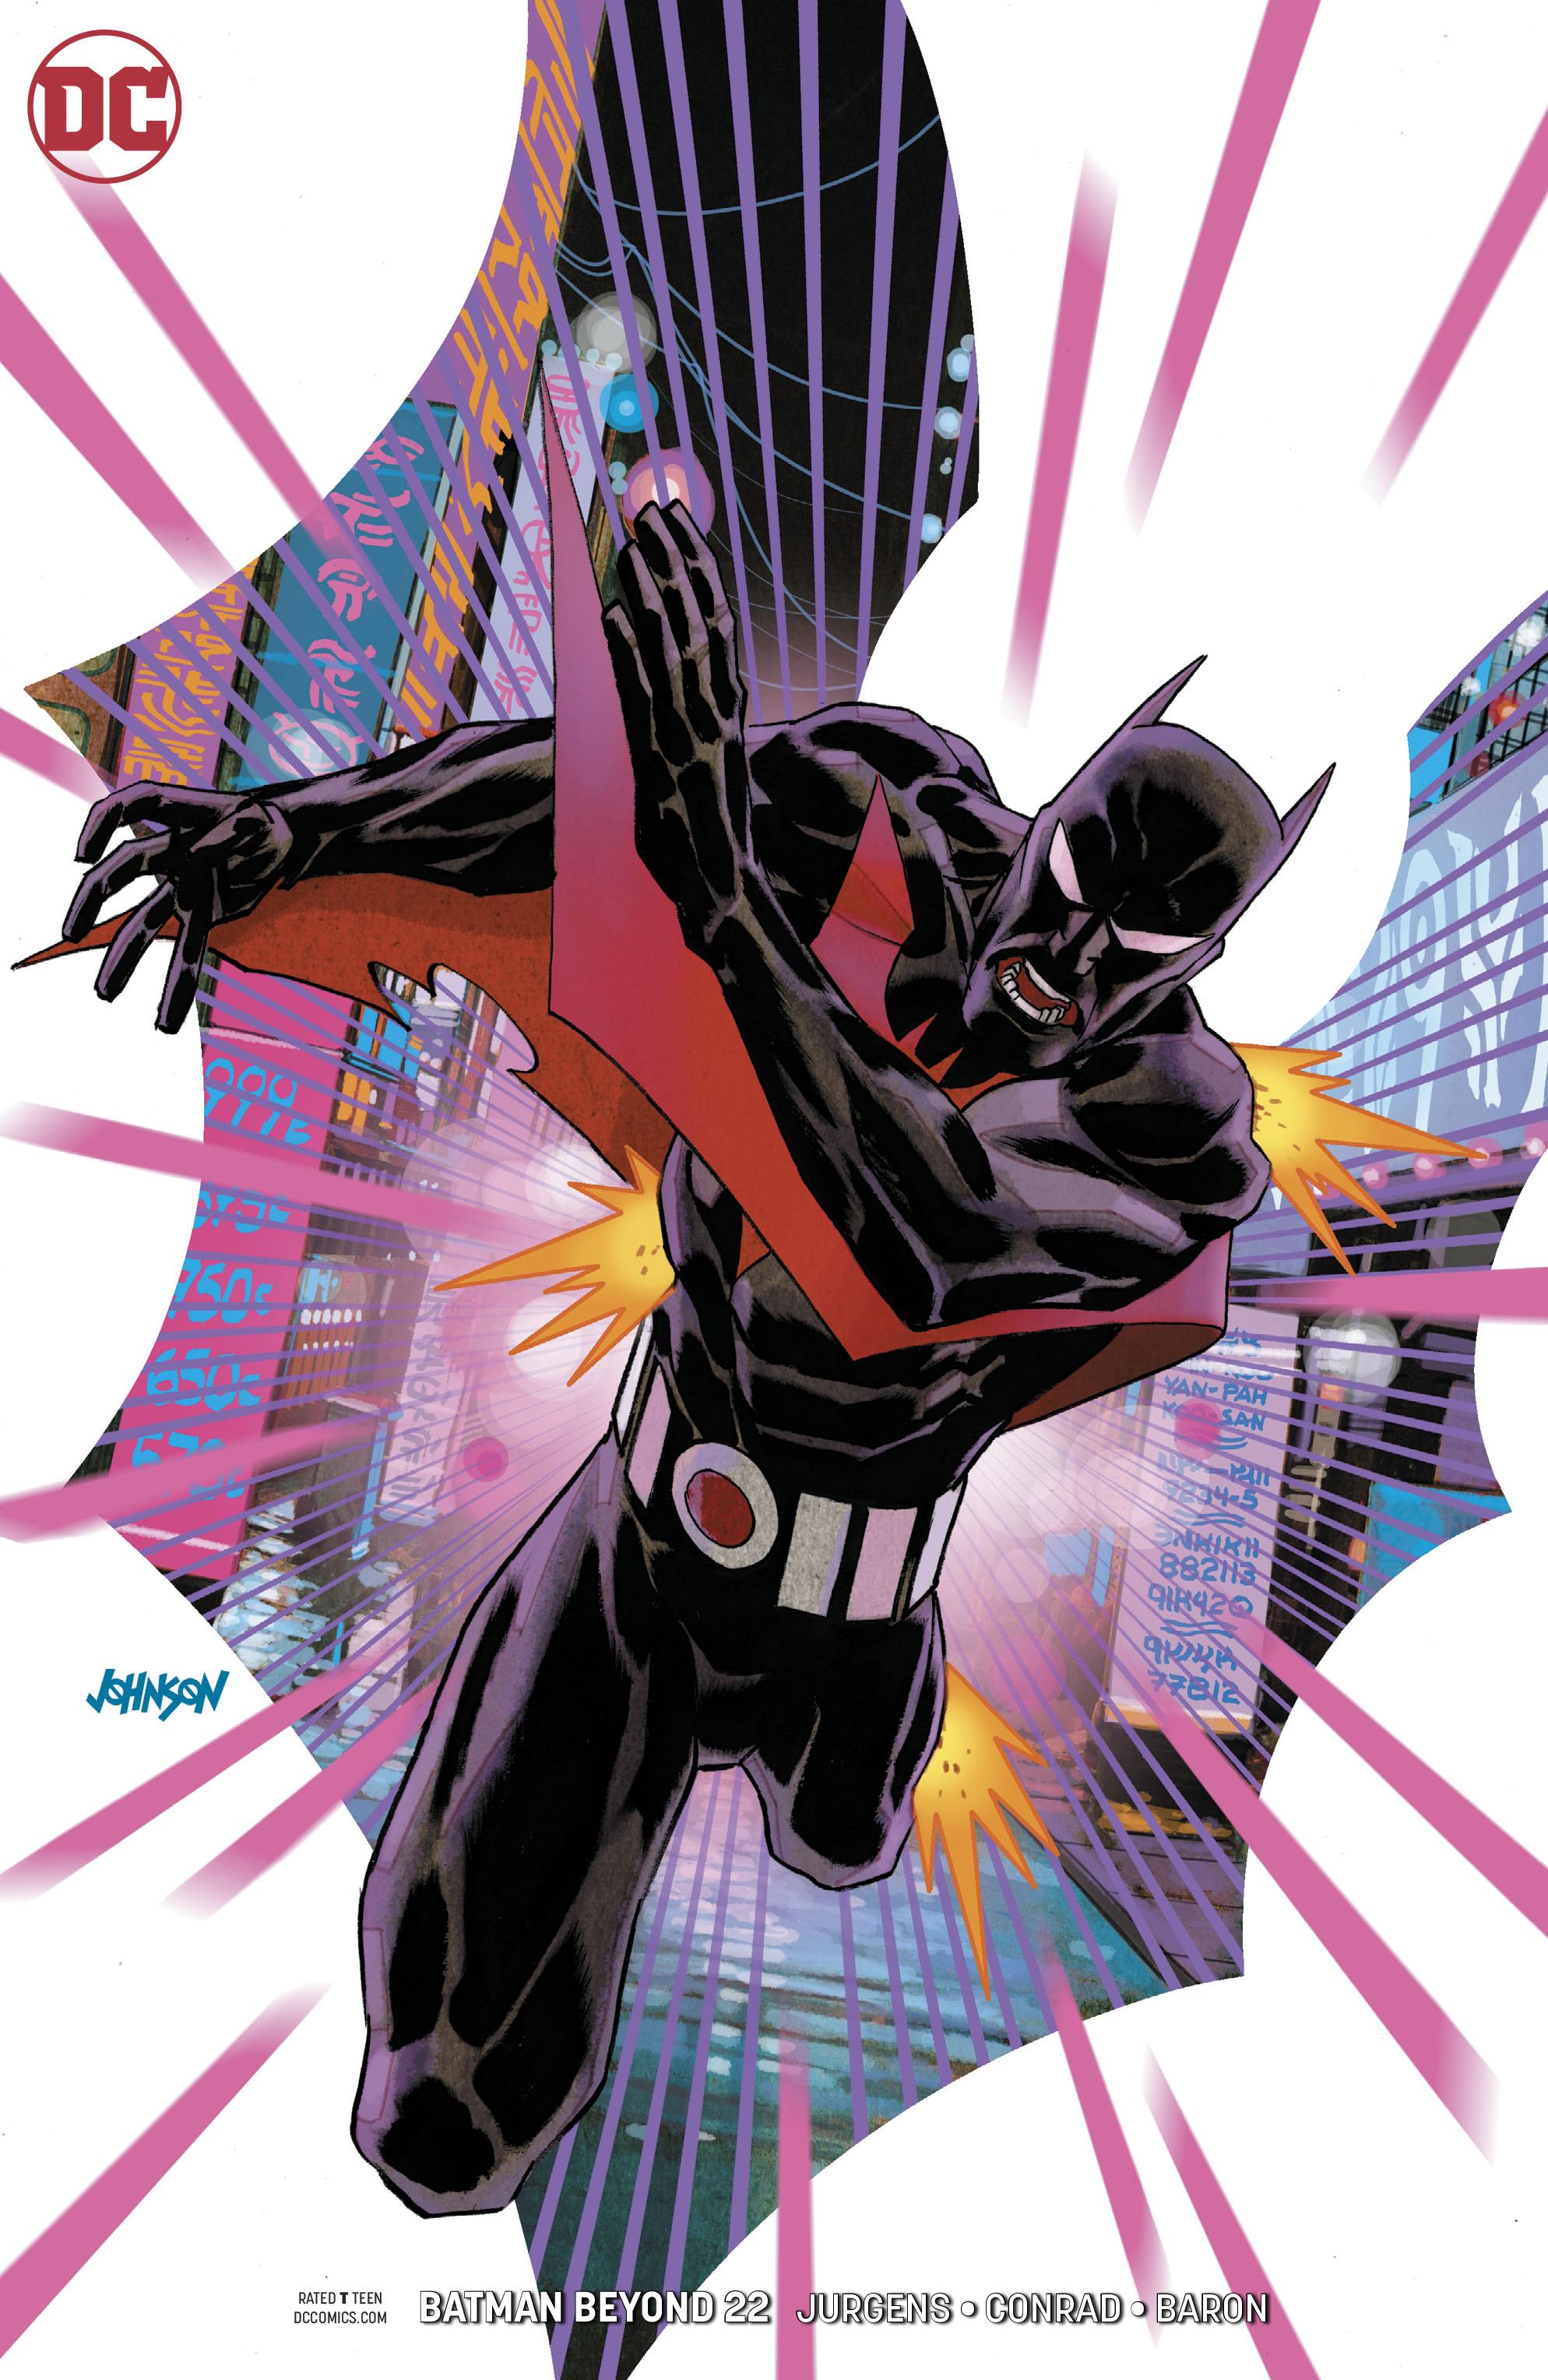 BATMAN BEYOND #22 VAR ED